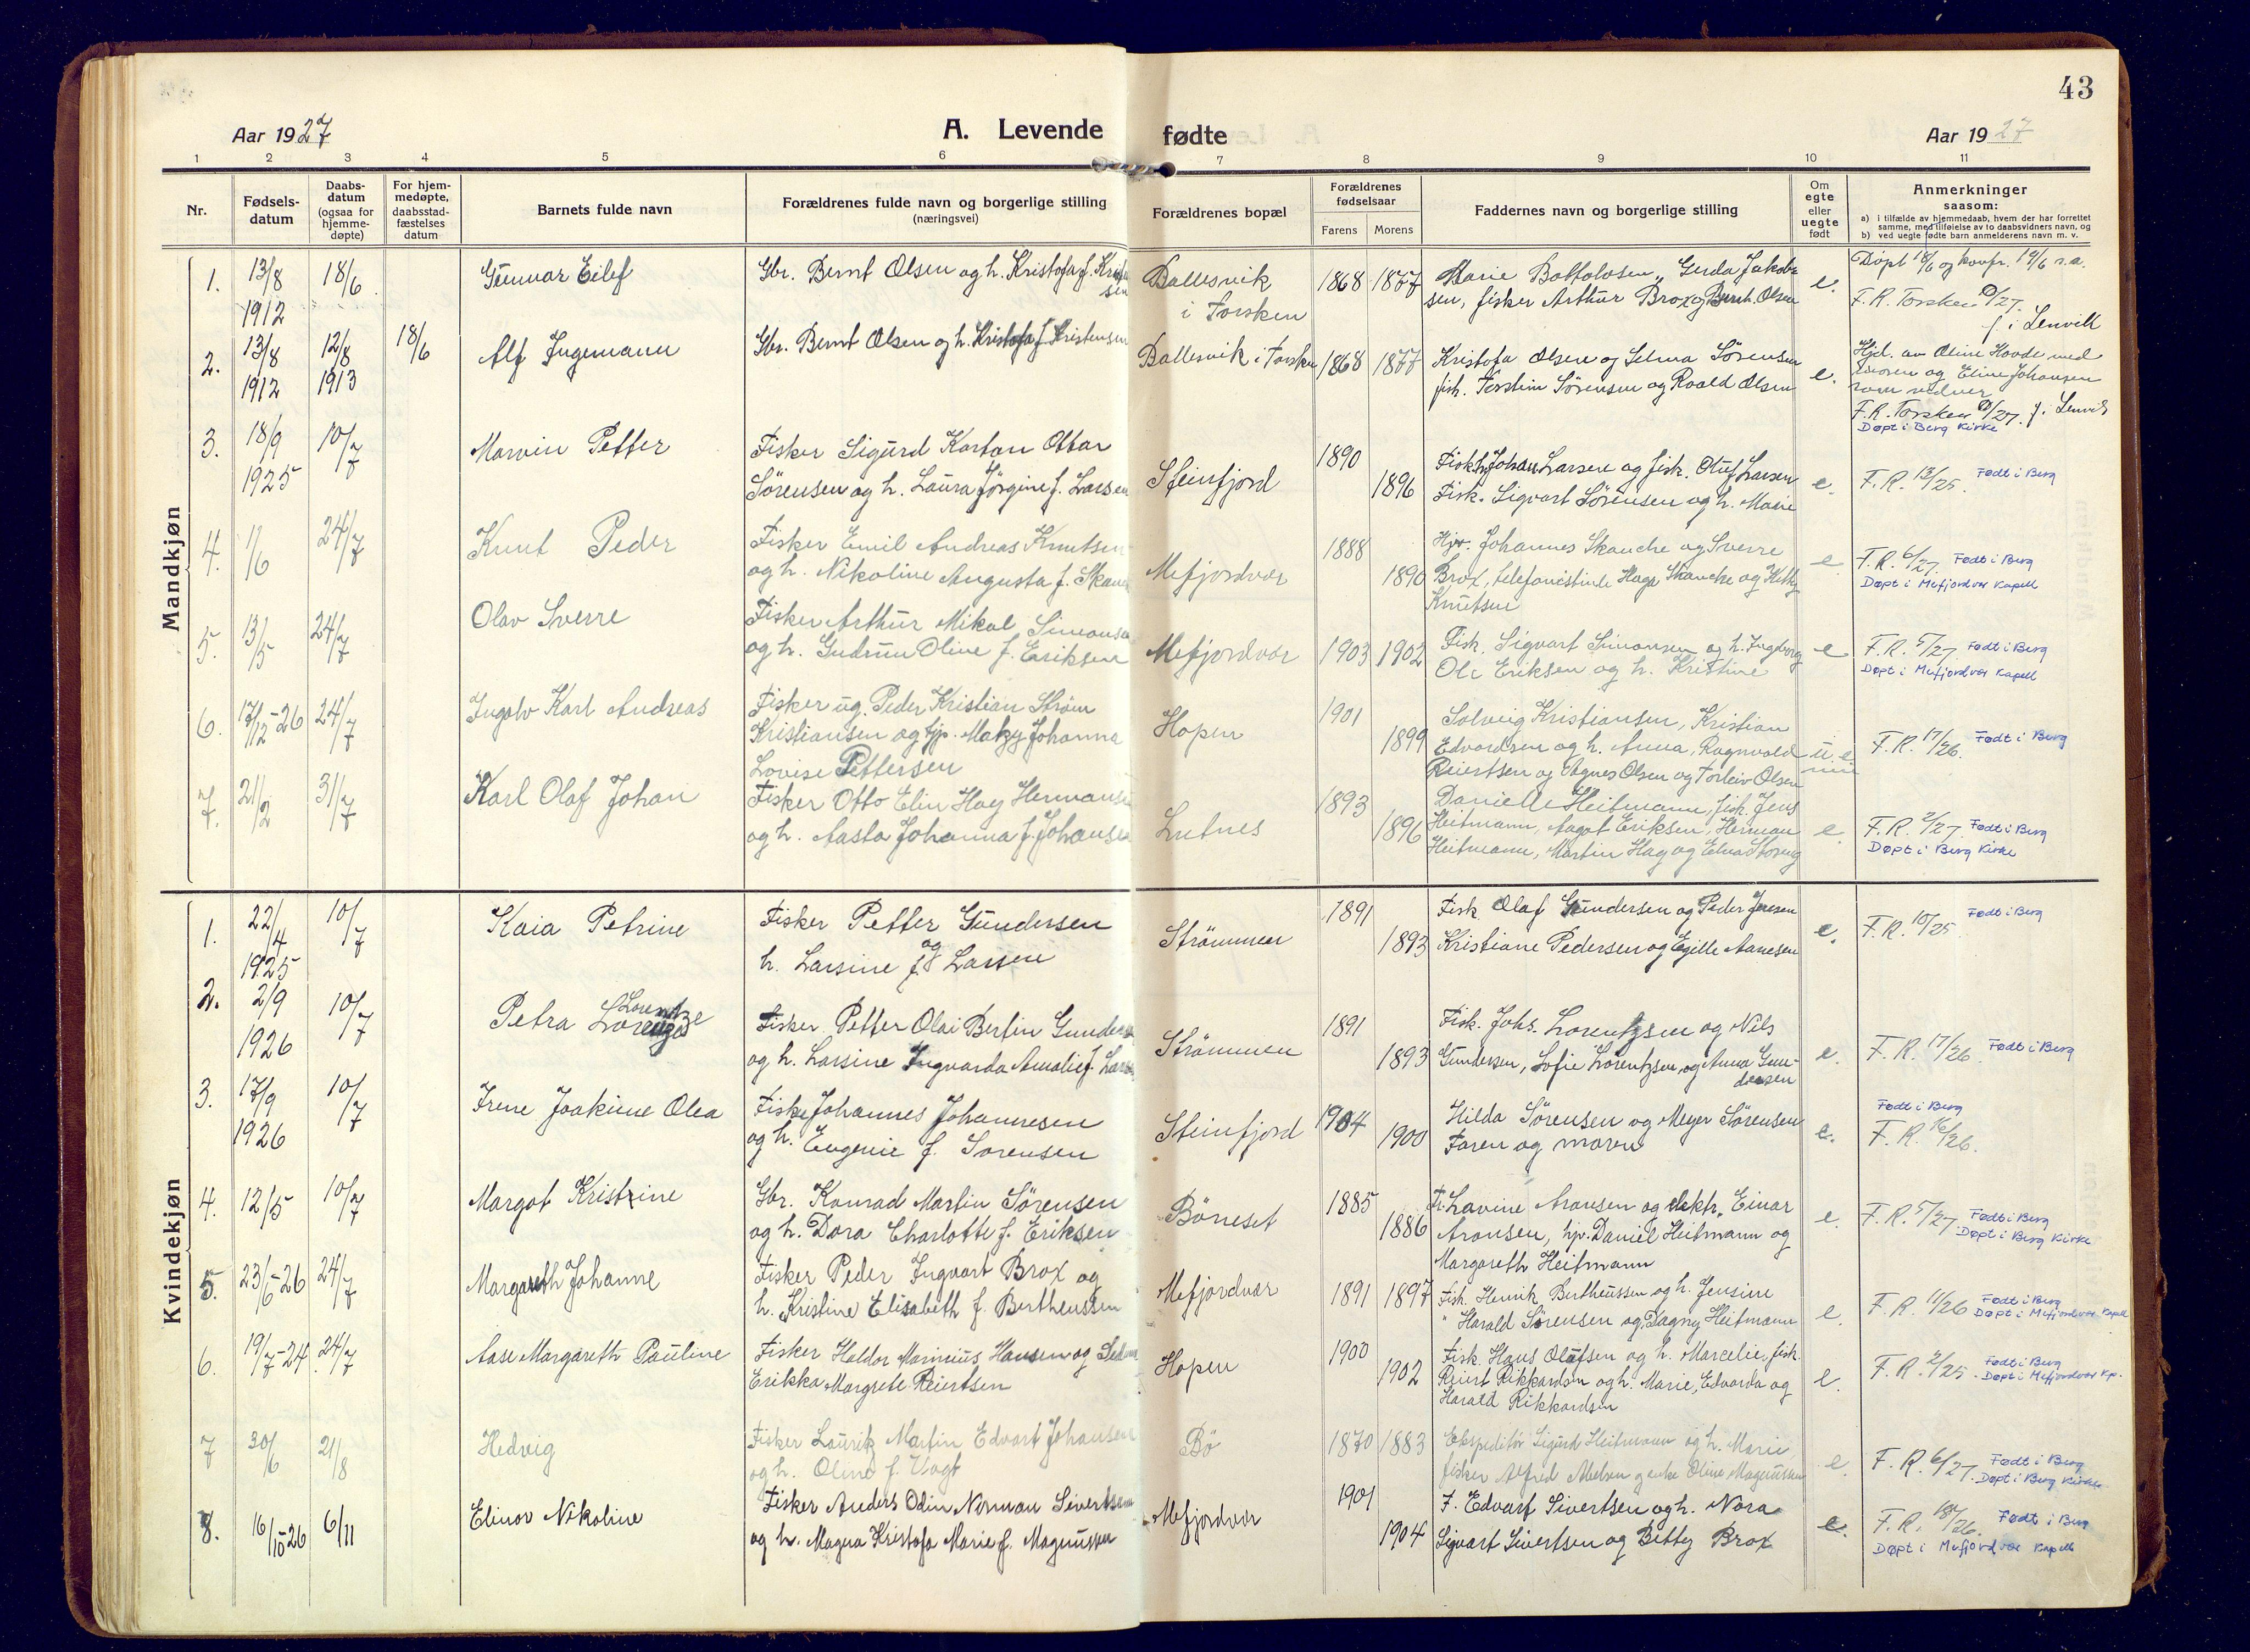 SATØ, Mefjord/Berg sokneprestkontor, G/Ga/Gaa: Ministerialbok nr. 9, 1916-1928, s. 43